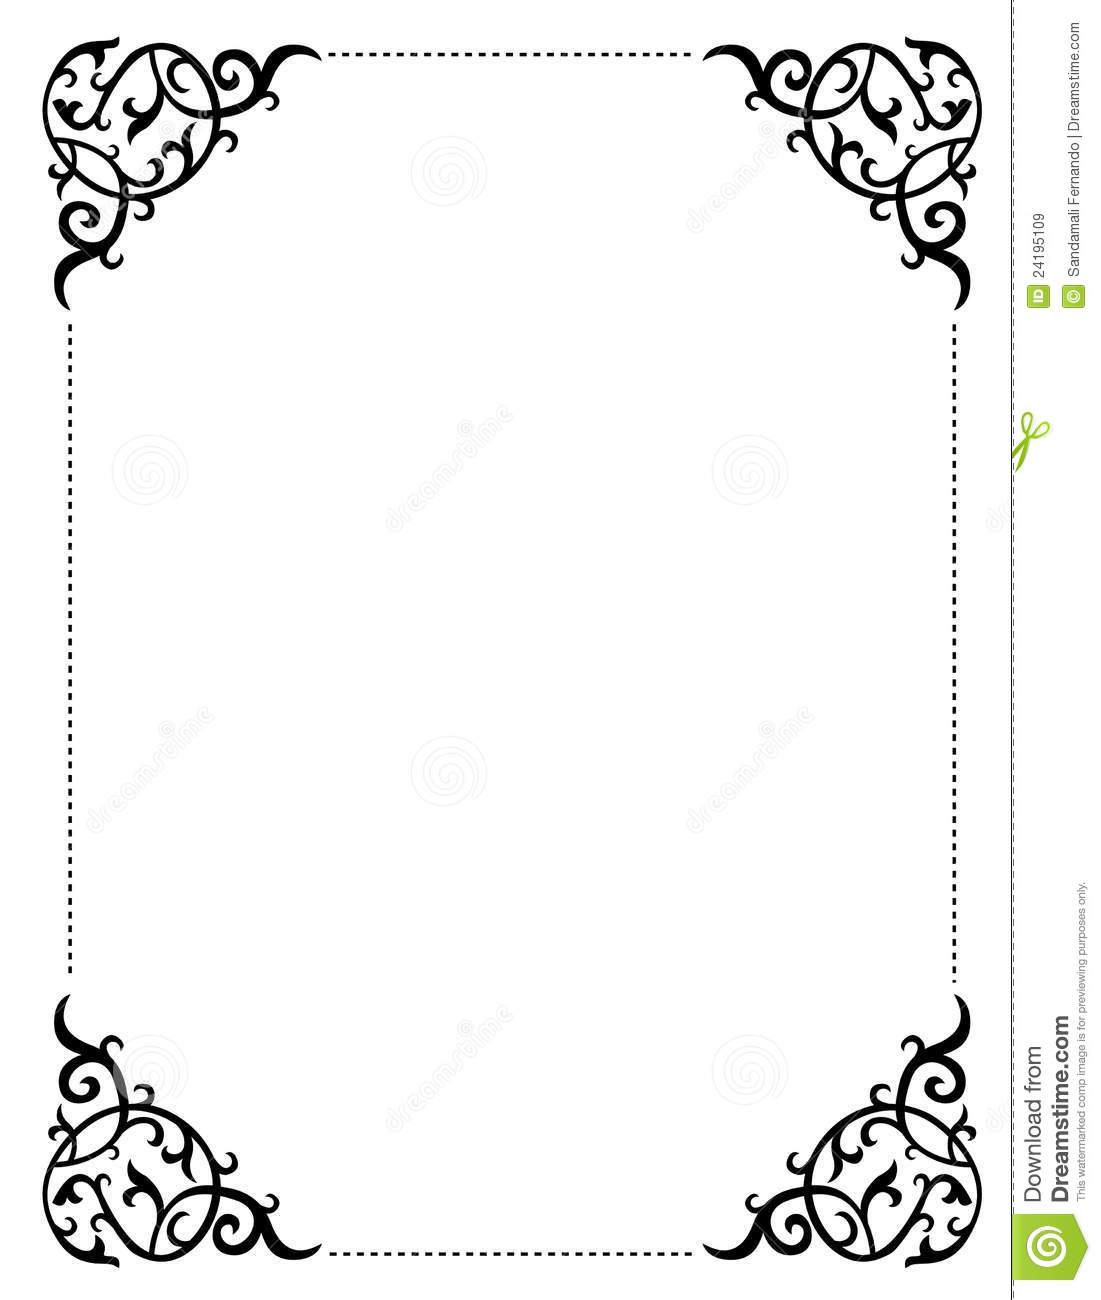 5 Images of Free Printable Wedding Borders